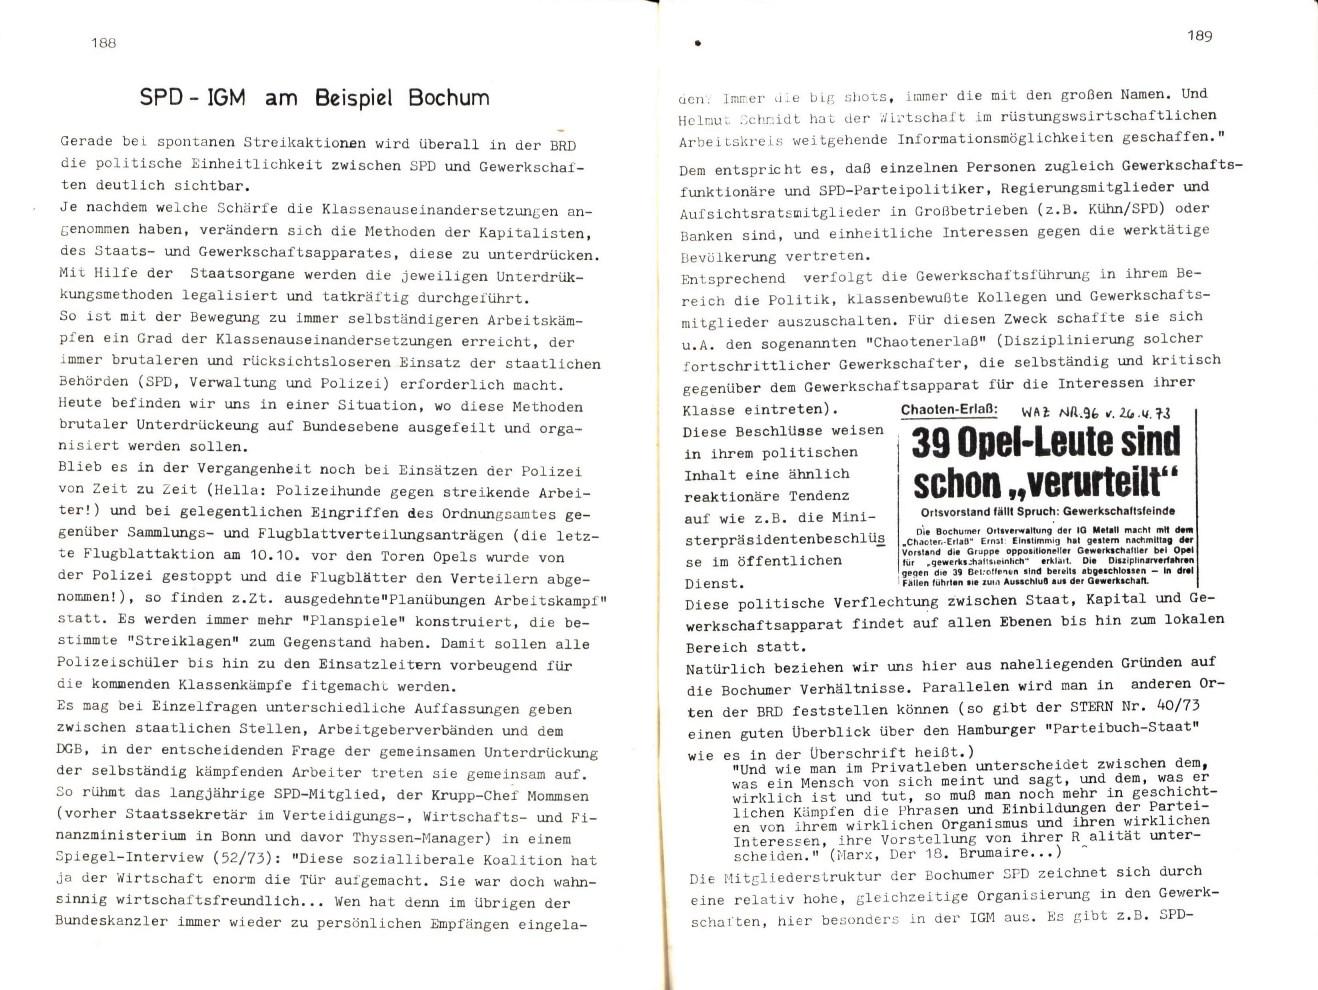 Bochum_IGM_Opel_PG_Opel_streikt_1973_097